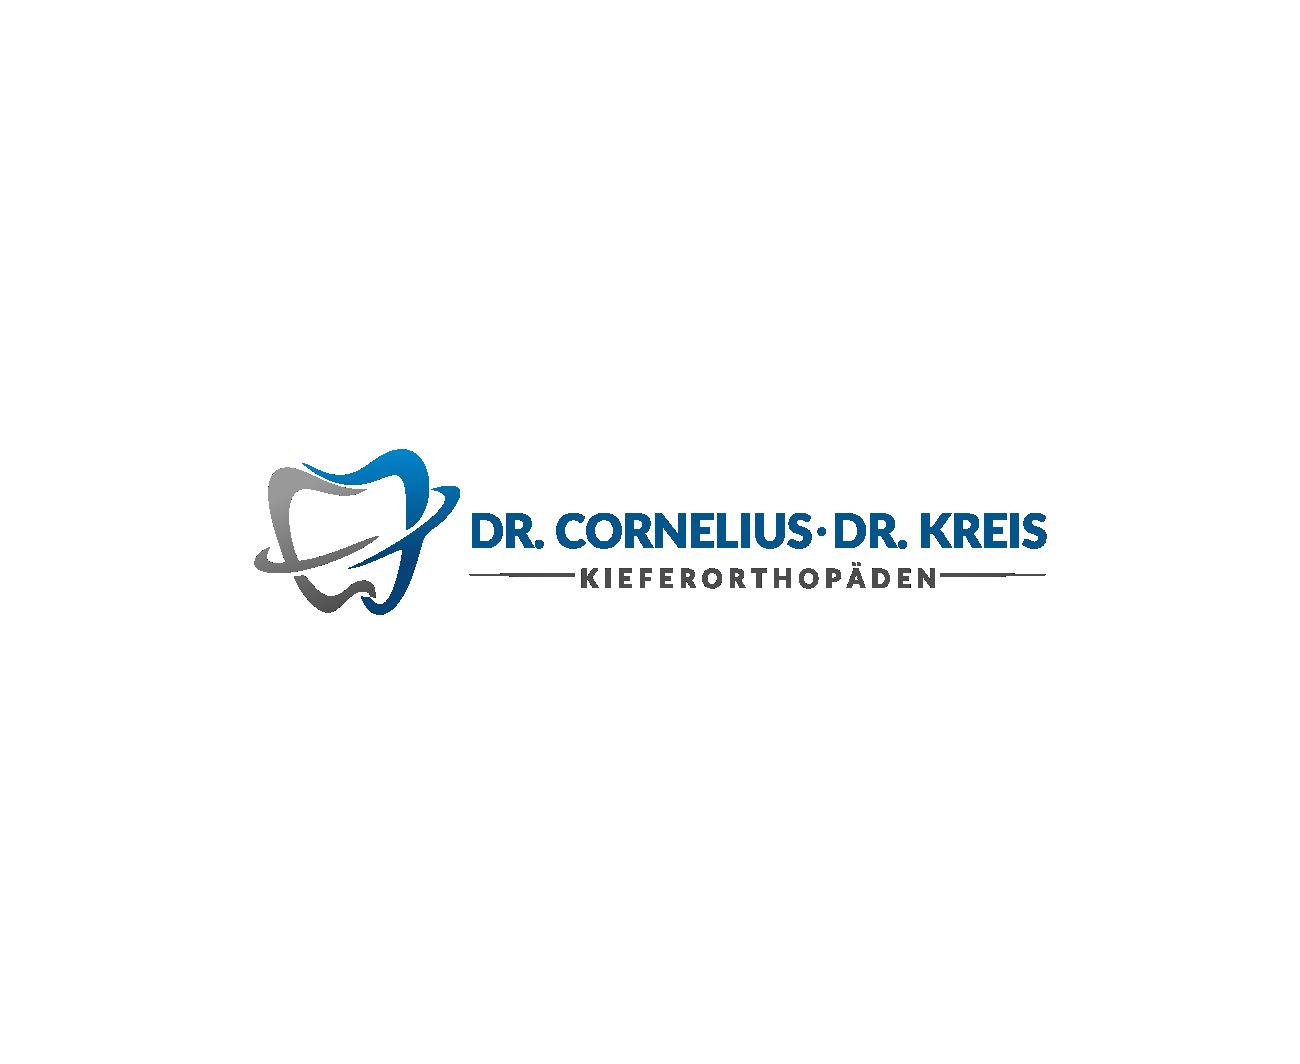 Orthodontists go online